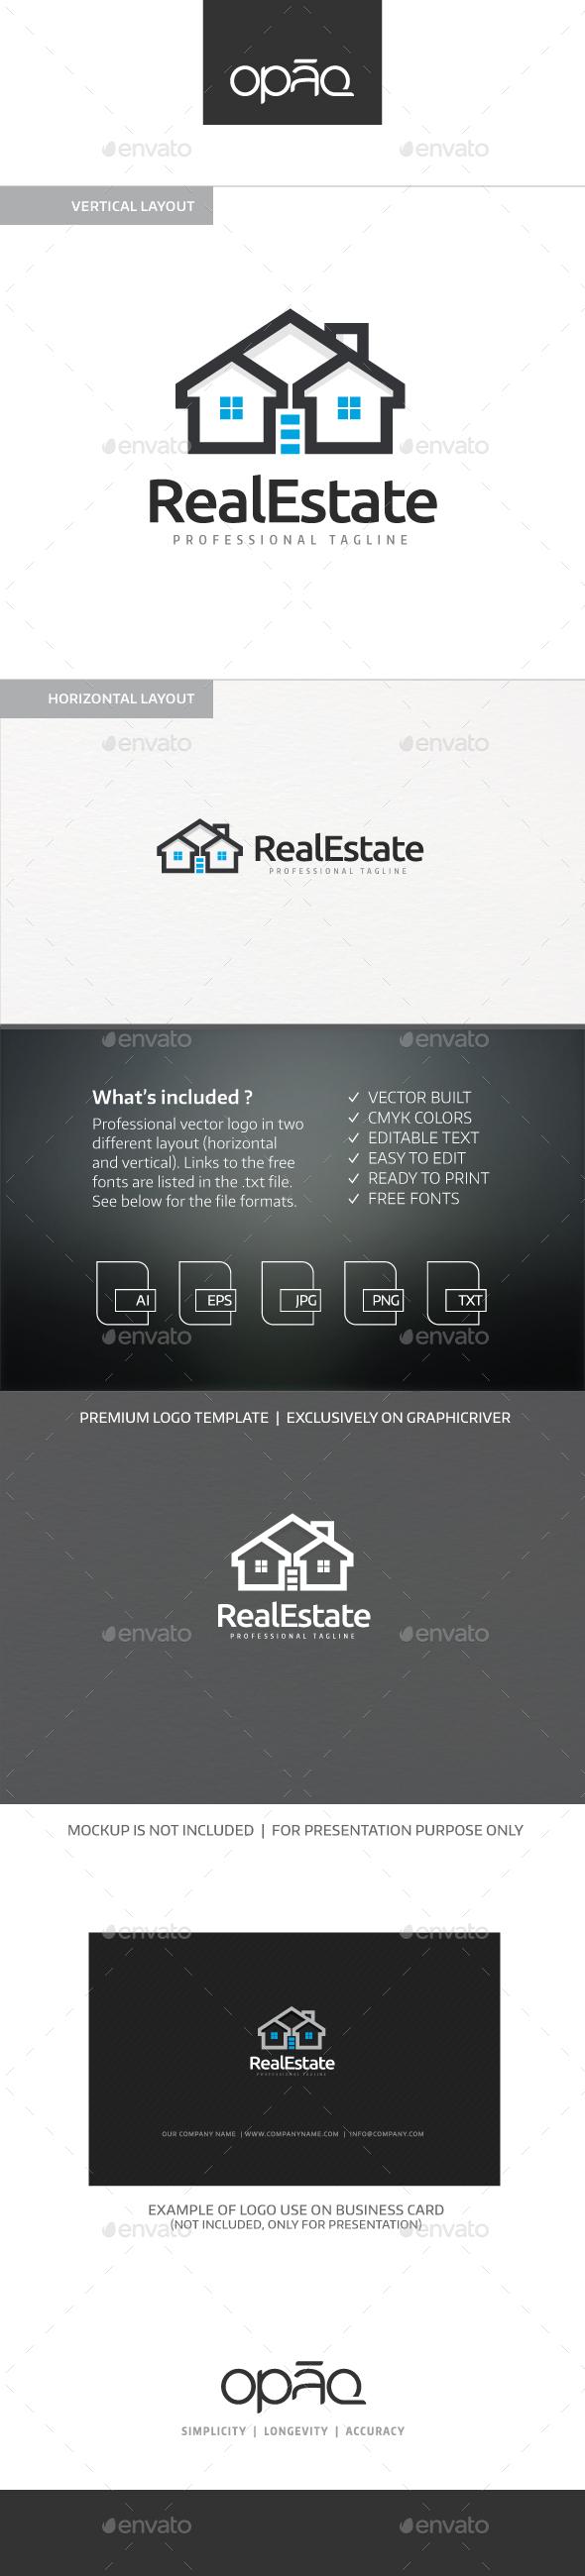 Real Estate Homes Logo - Buildings Logo Templates